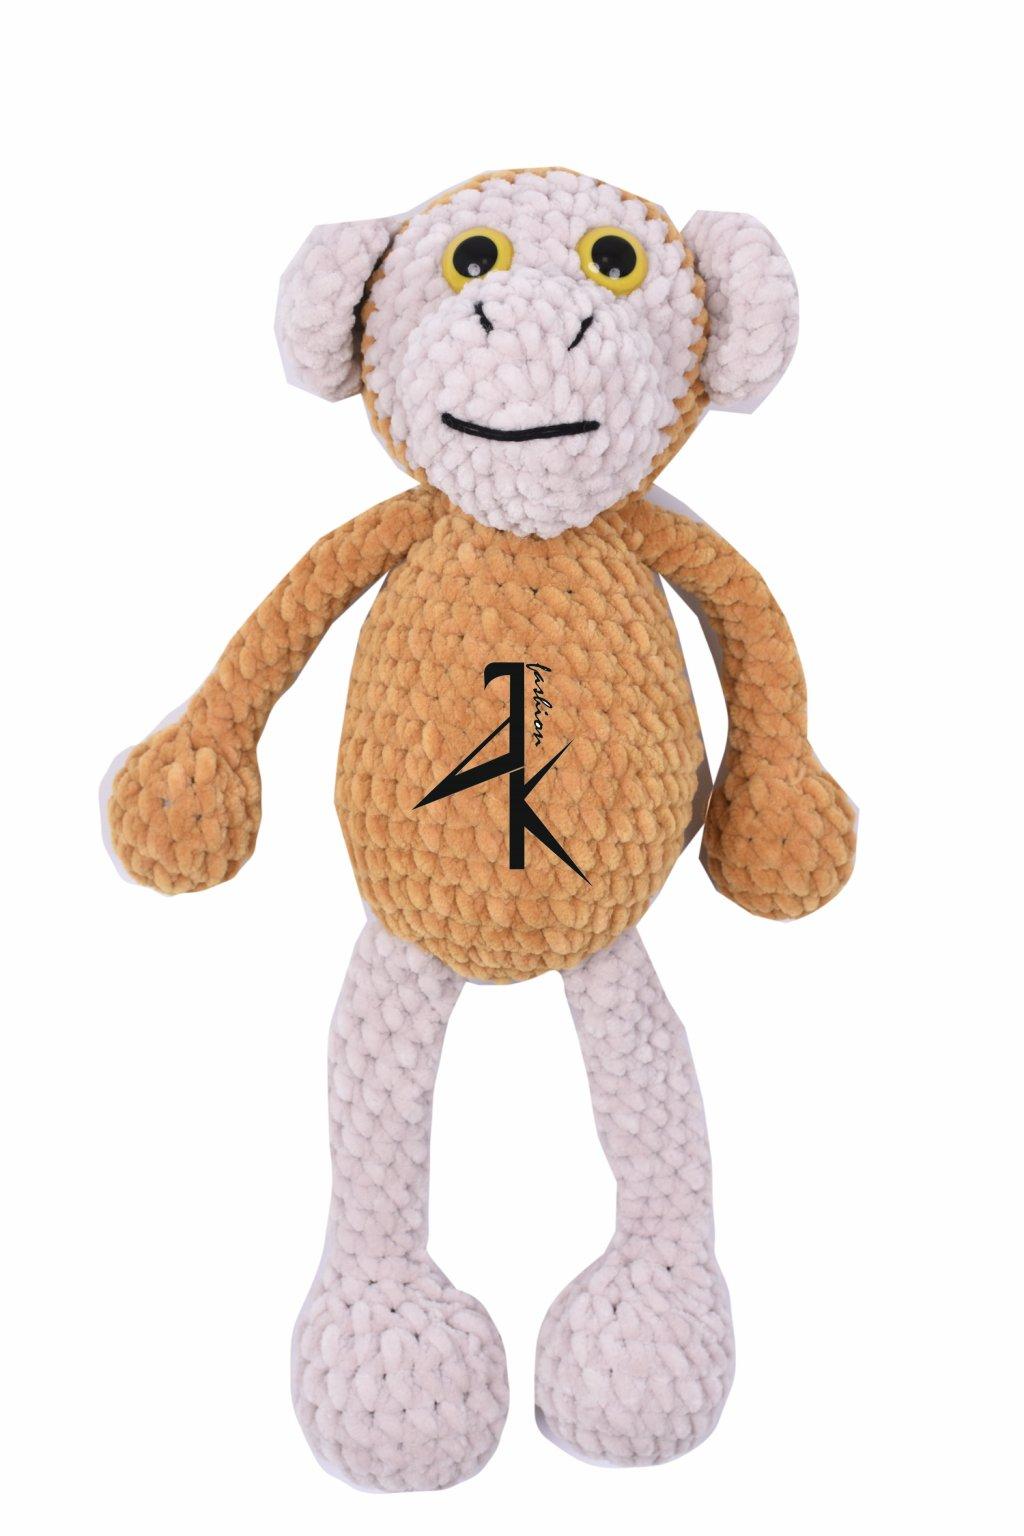 dekorace hracky hackovana opice 111